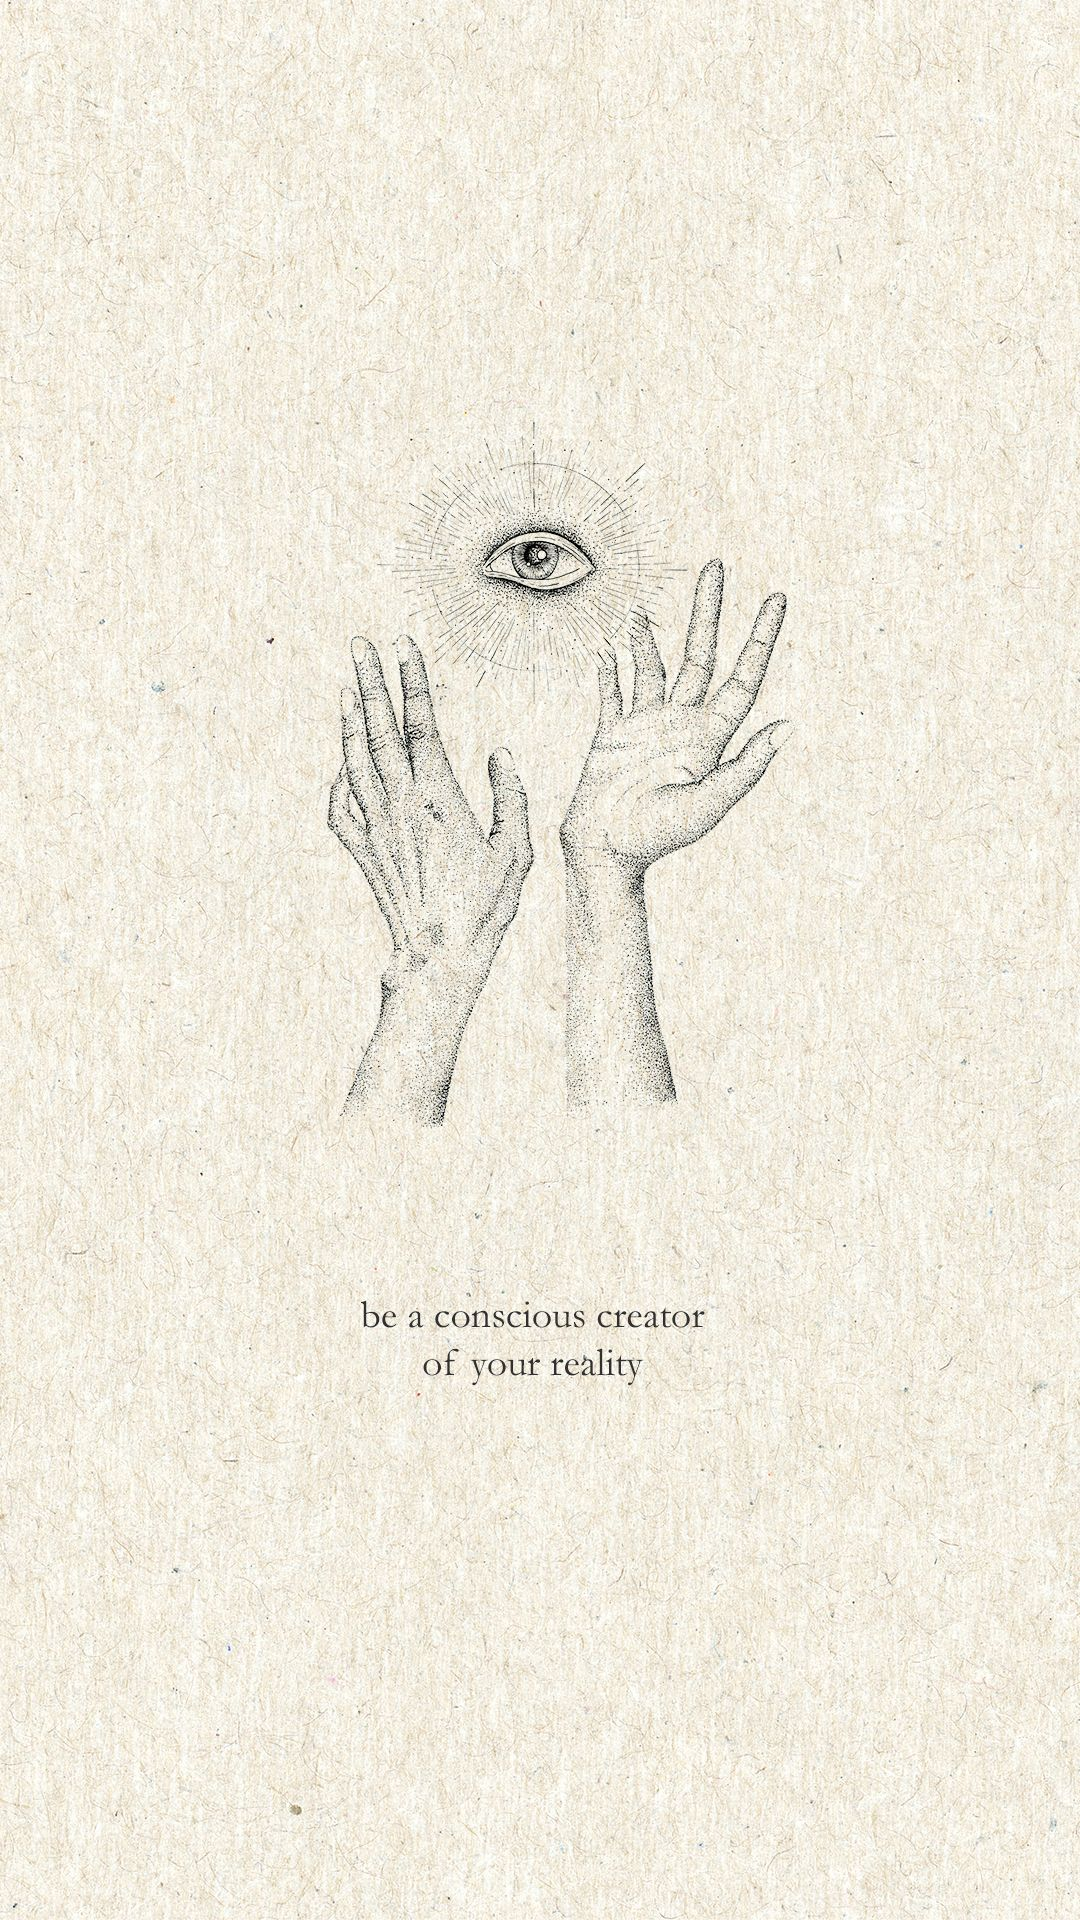 Be a conscious creator print